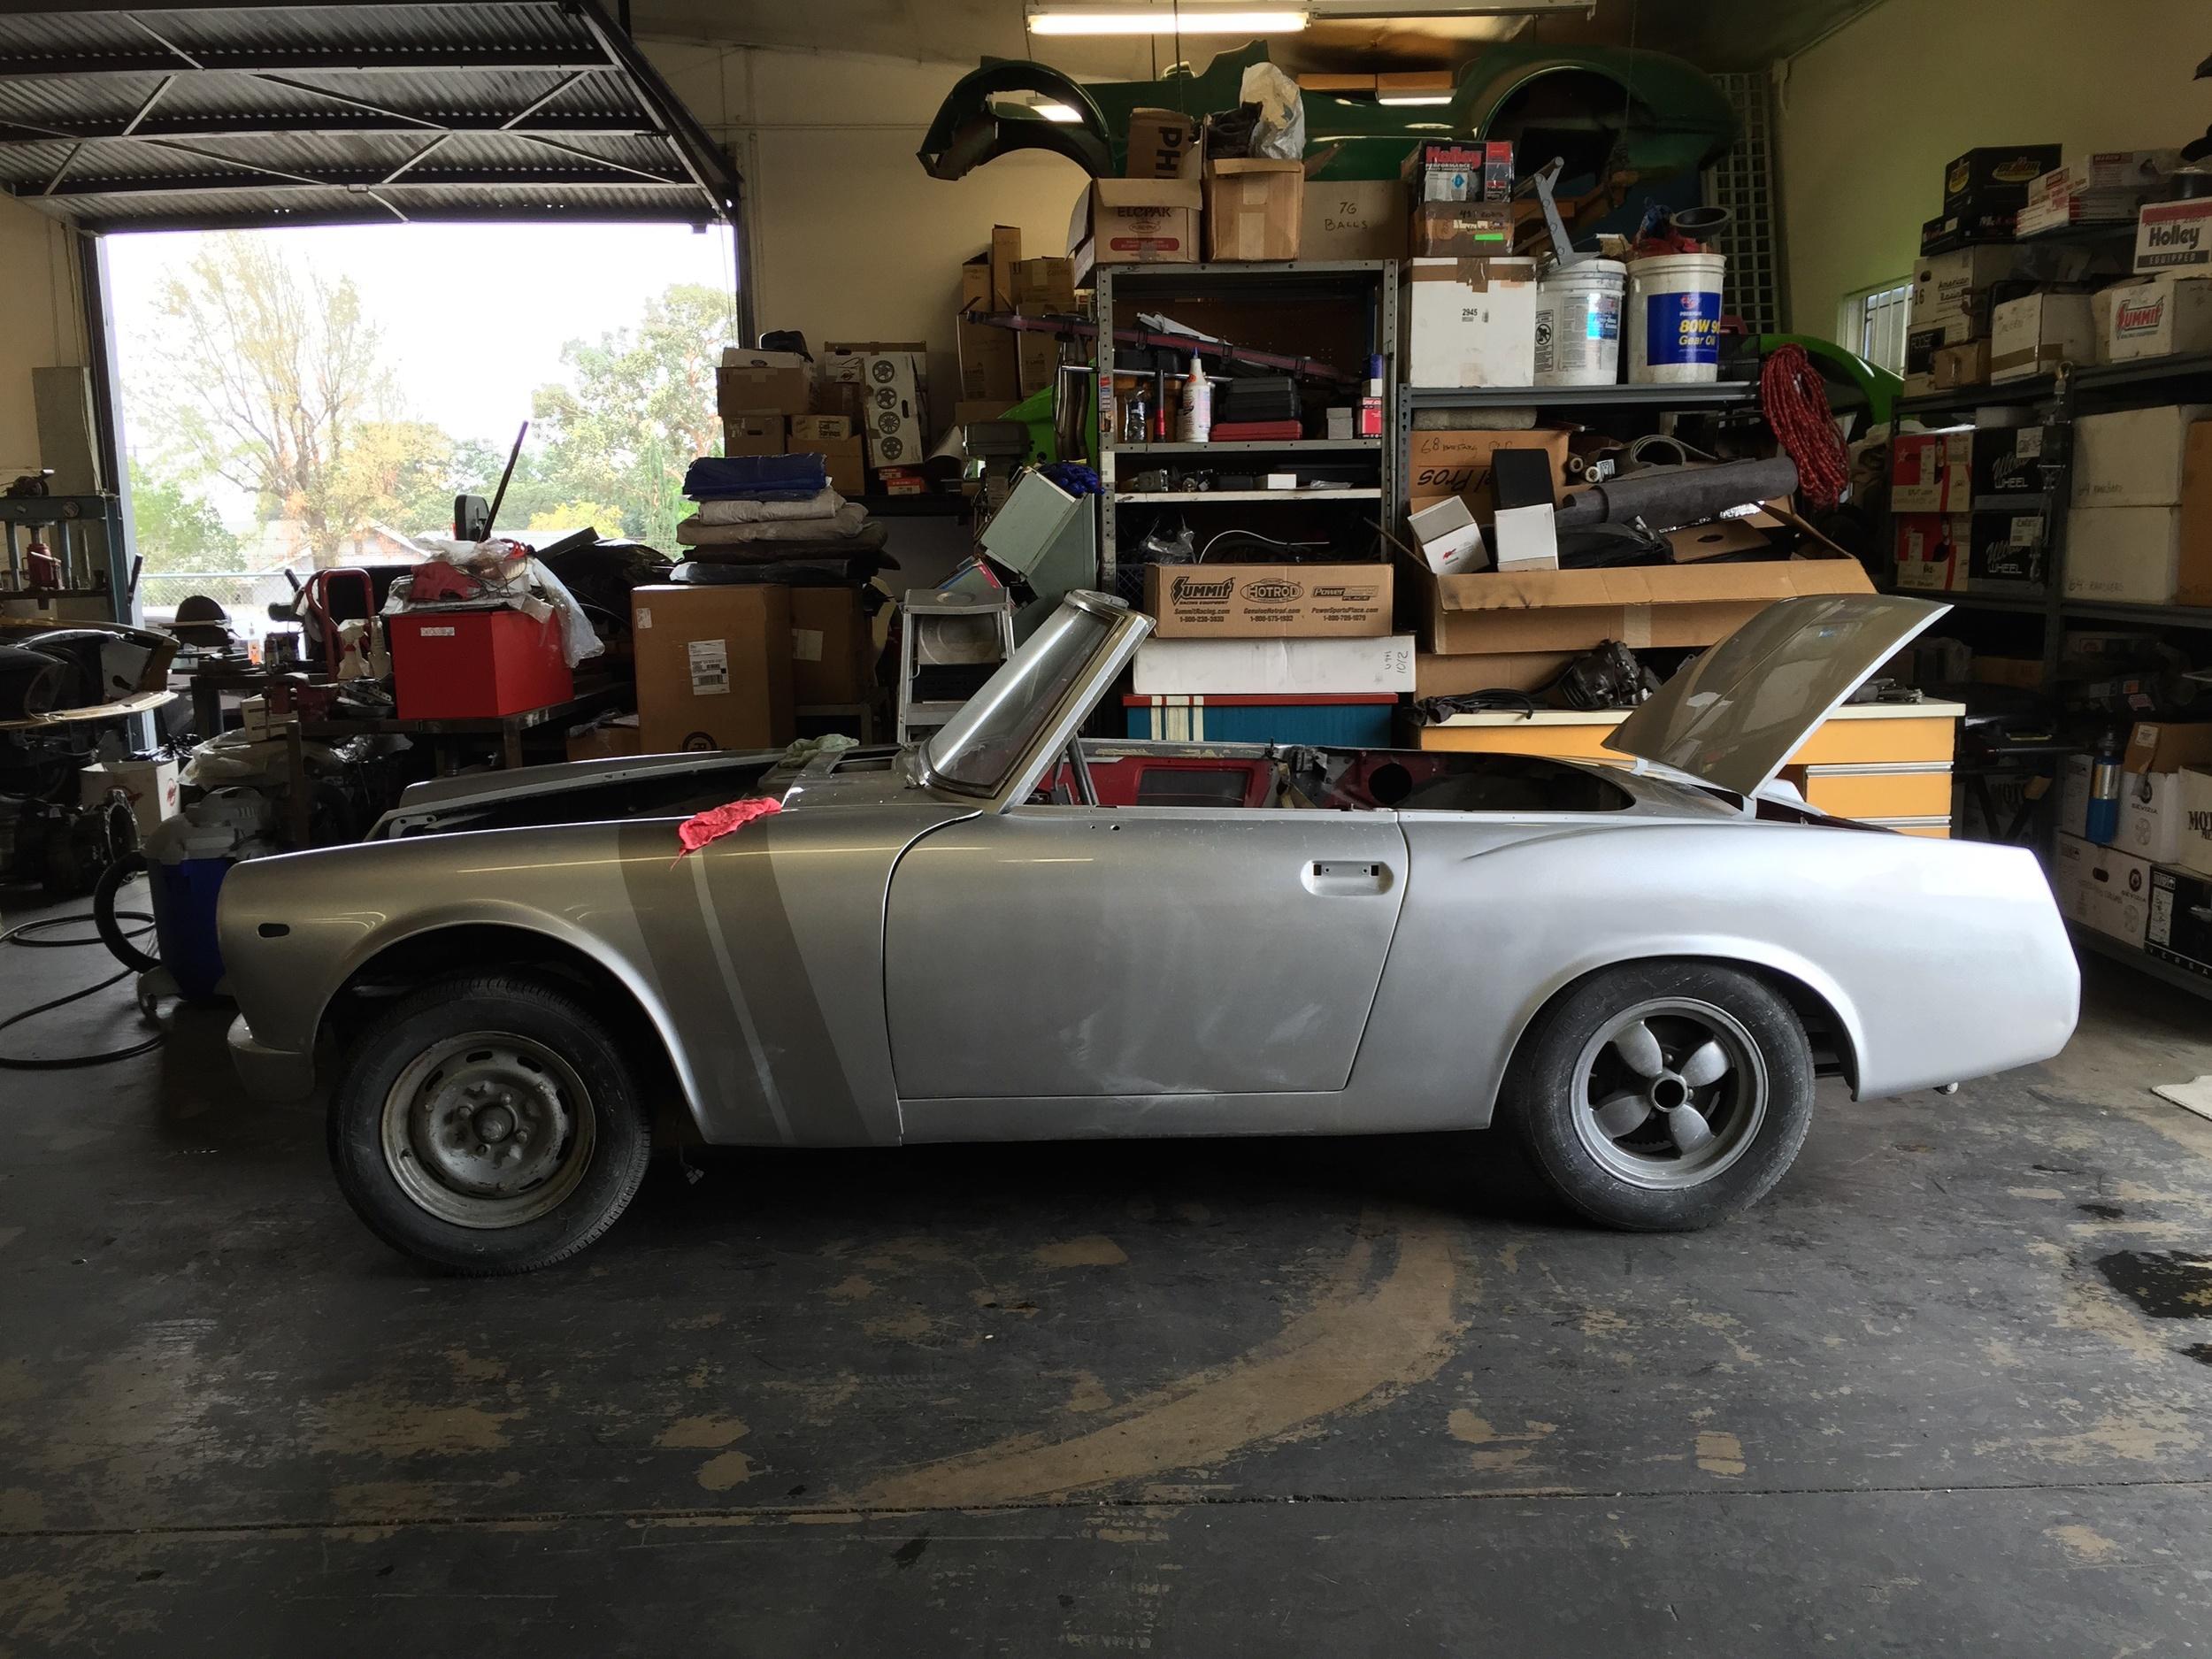 My '69 Datsun Roadster project